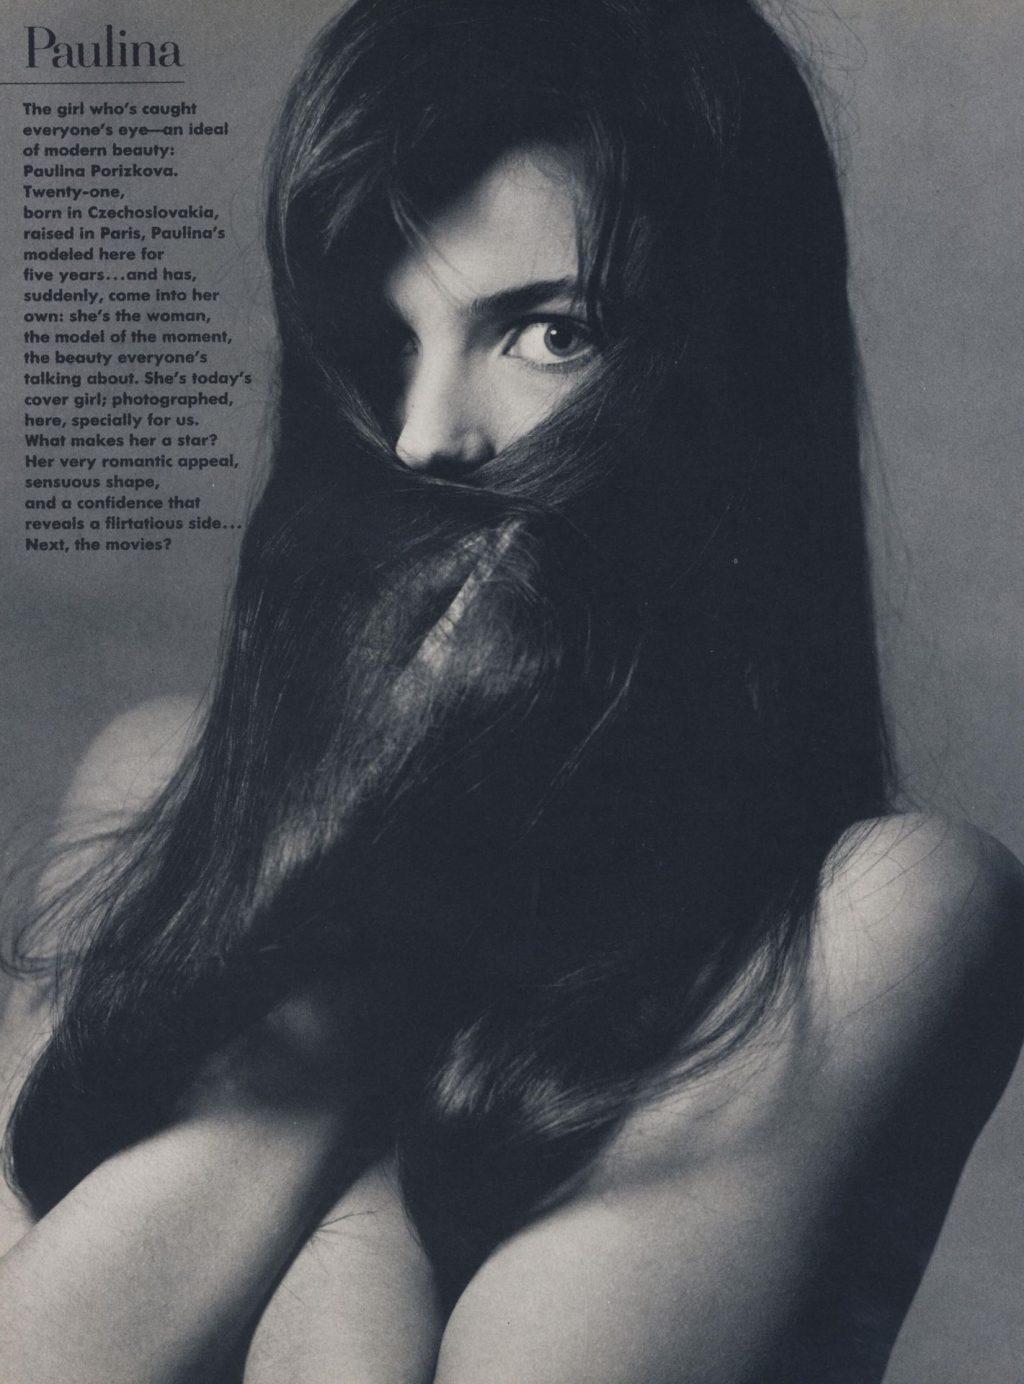 Paulina Porizkova Nude (3 Photos)